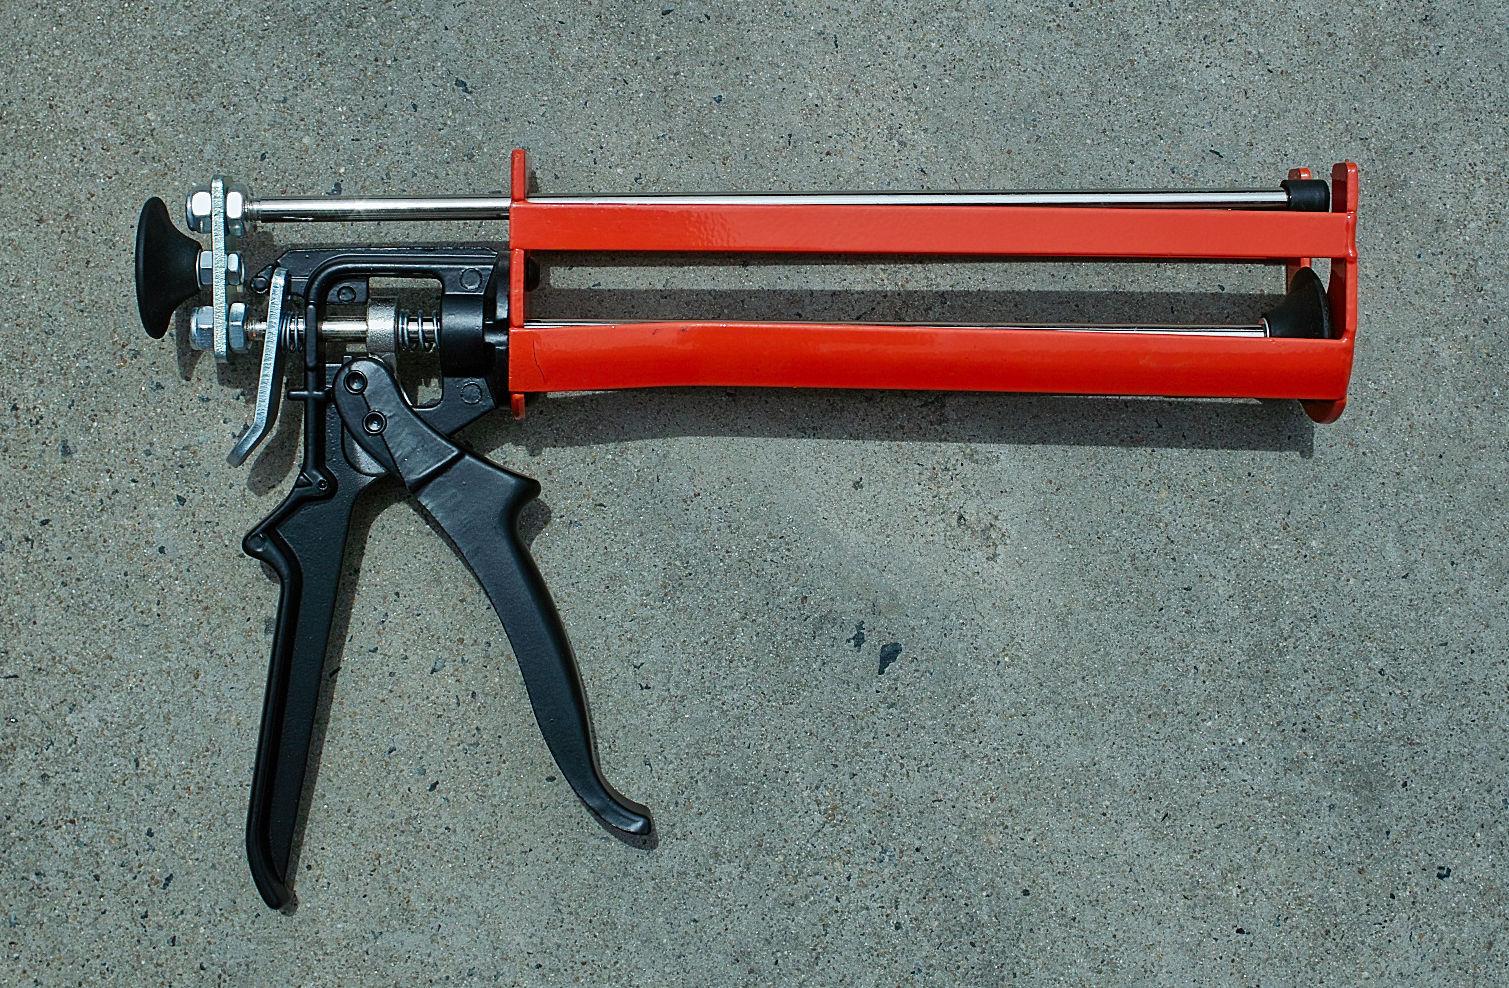 Heavy Duty Glass Glue : Caulking gun quot heavy duty cartridge glass glue adhesive